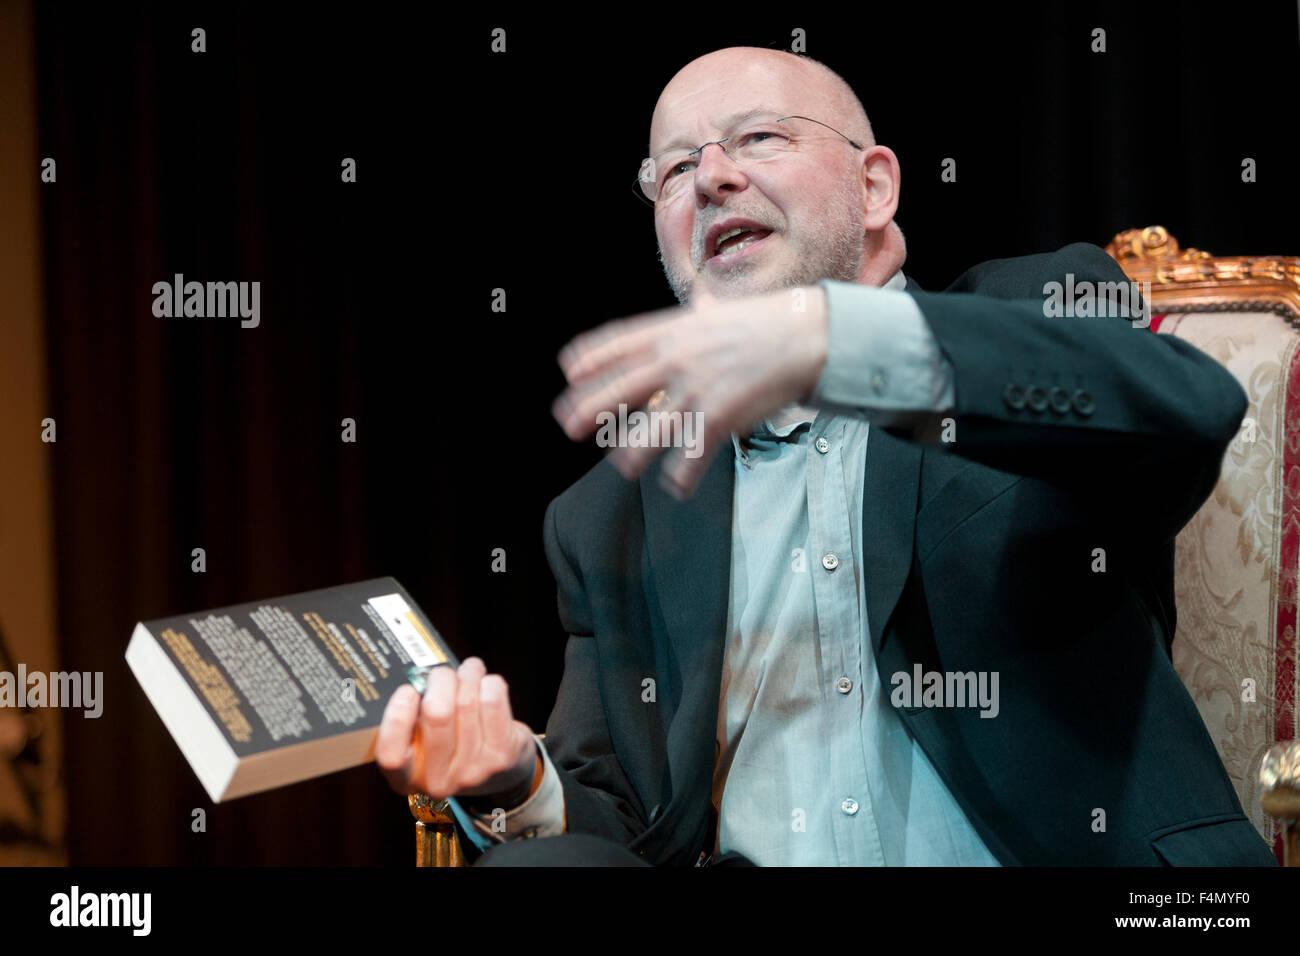 Douglas Jackson, author and former journalist, at the Summerhall Historical Fiction Festival 2015. Edinburgh, Scotland. - Stock Image